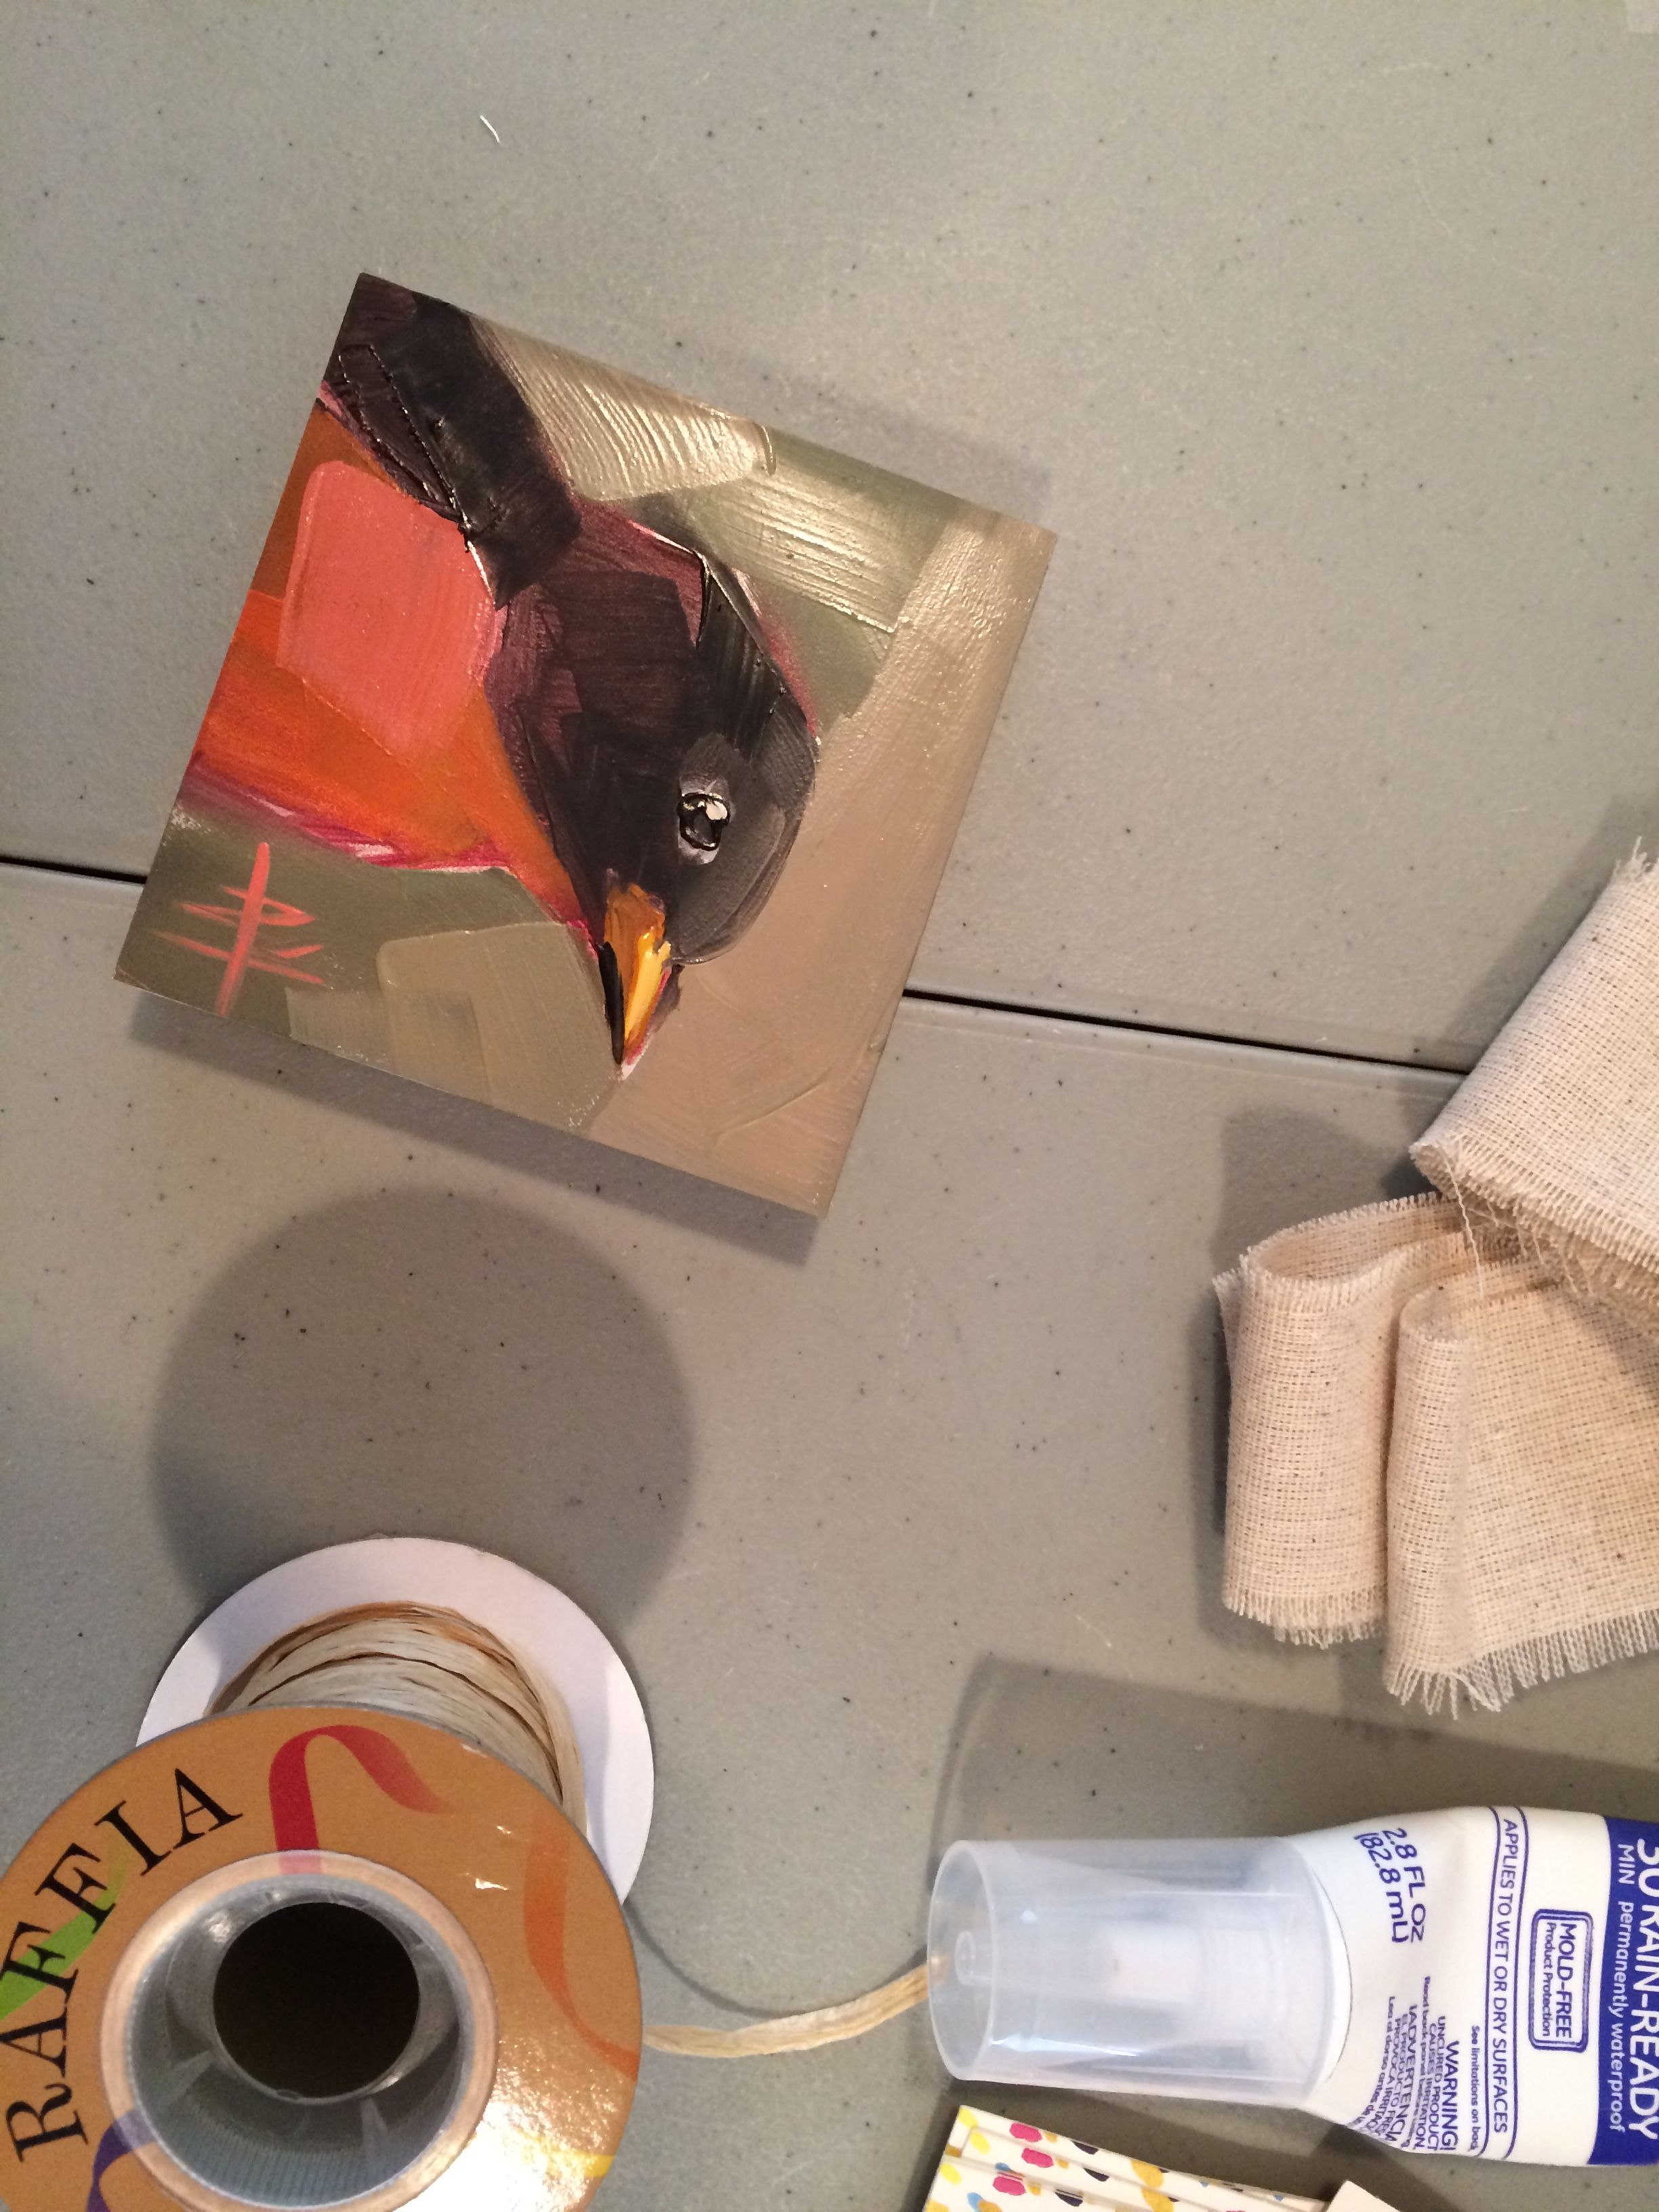 angela moulton paintings - Buscar con Google